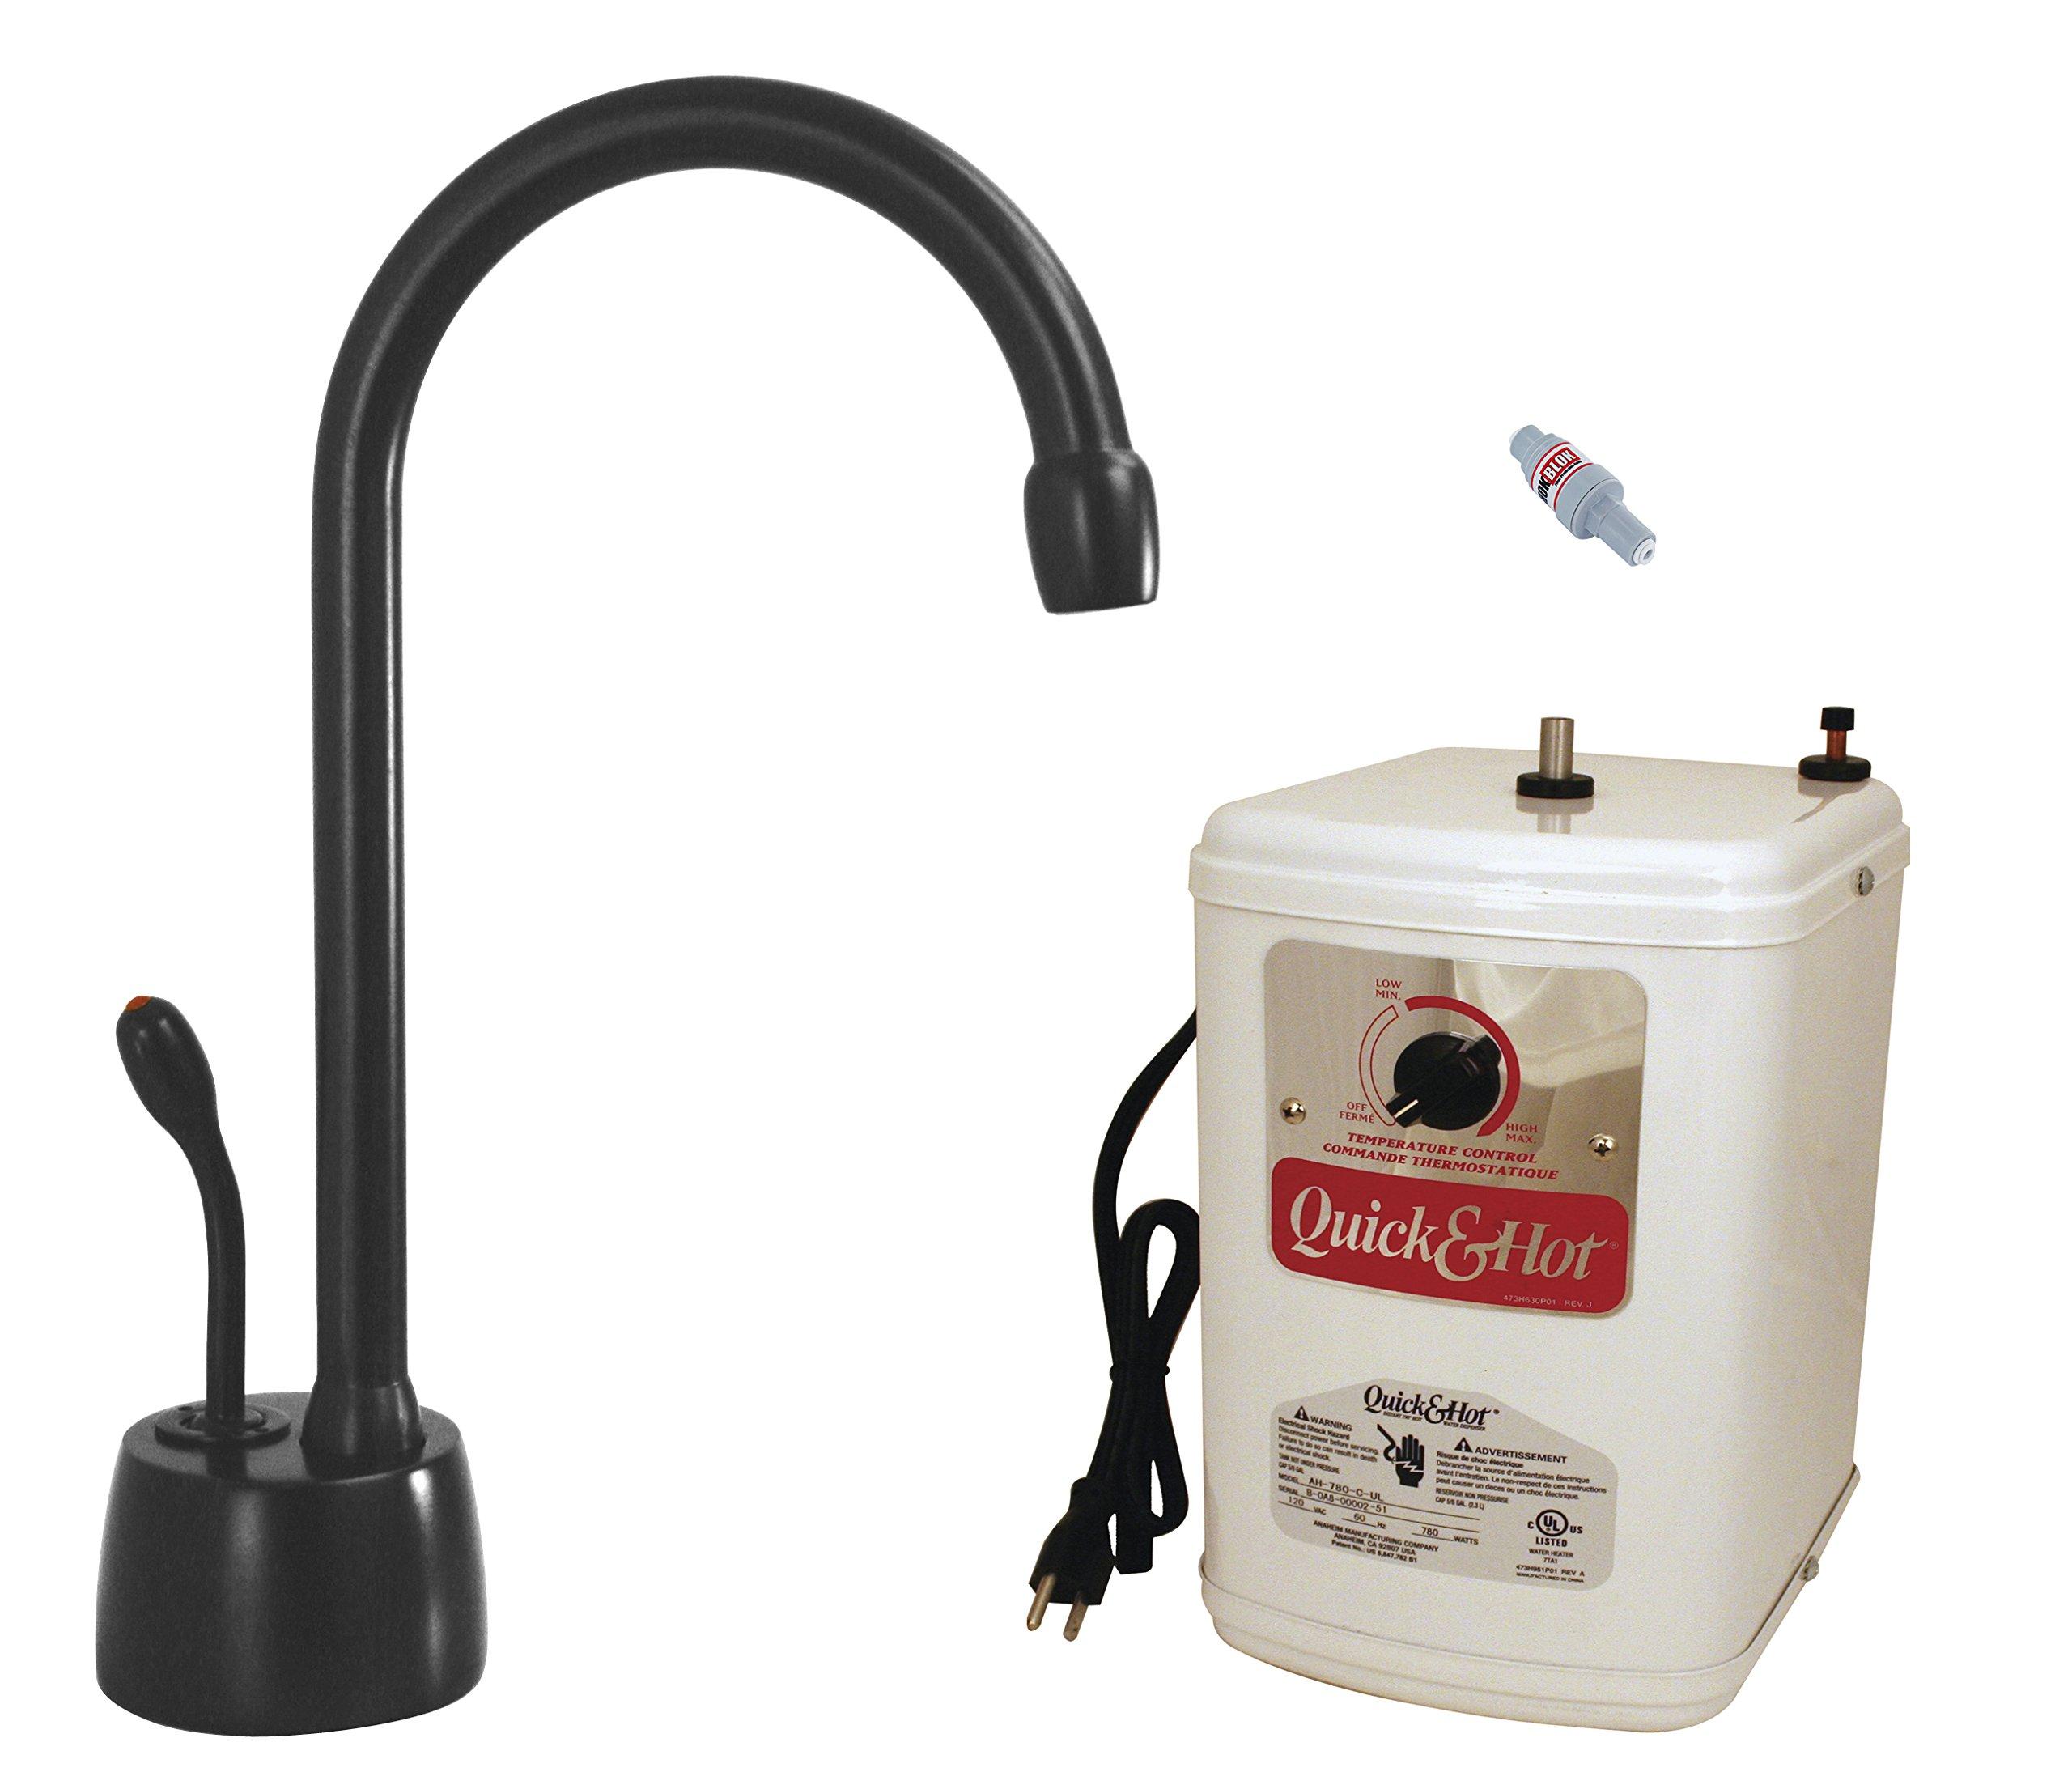 Westbrass D271HFP-62 Velosah Contemporary Water Dispenser, Matte Black by Westbrass